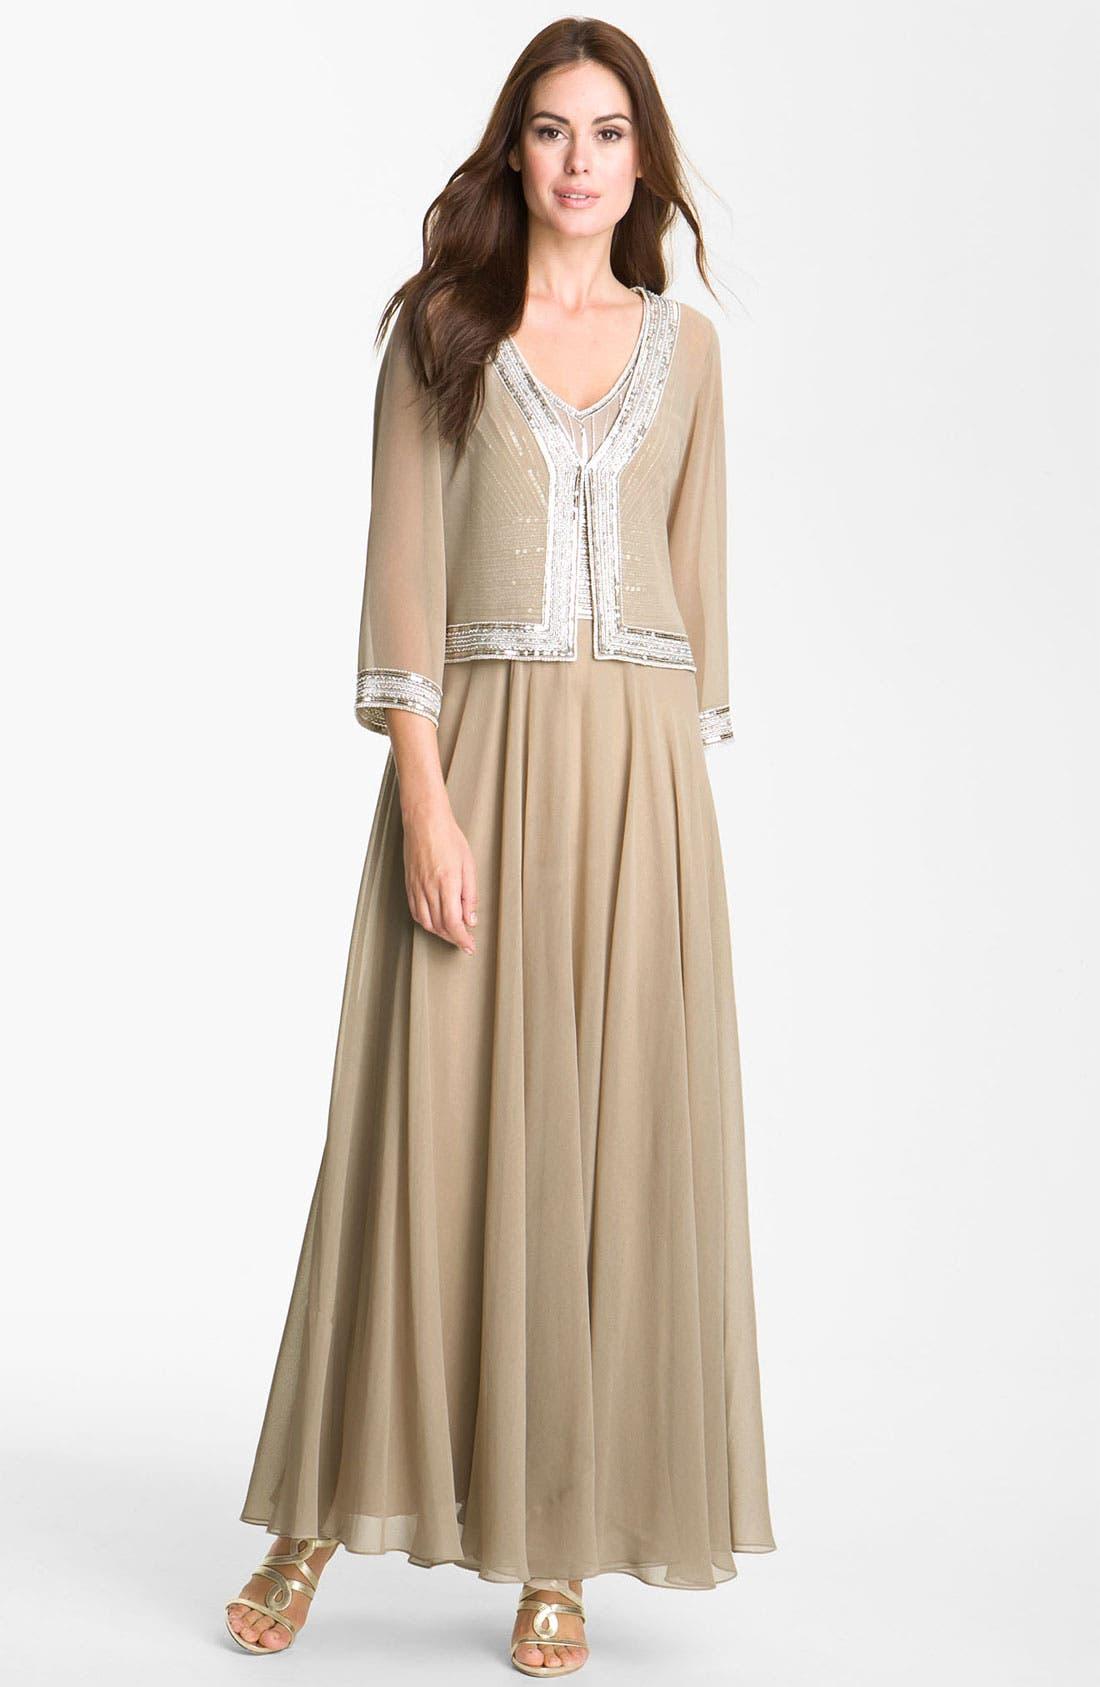 Alternate Image 1 Selected - J Kara Embellished Chiffon Gown & Jacket